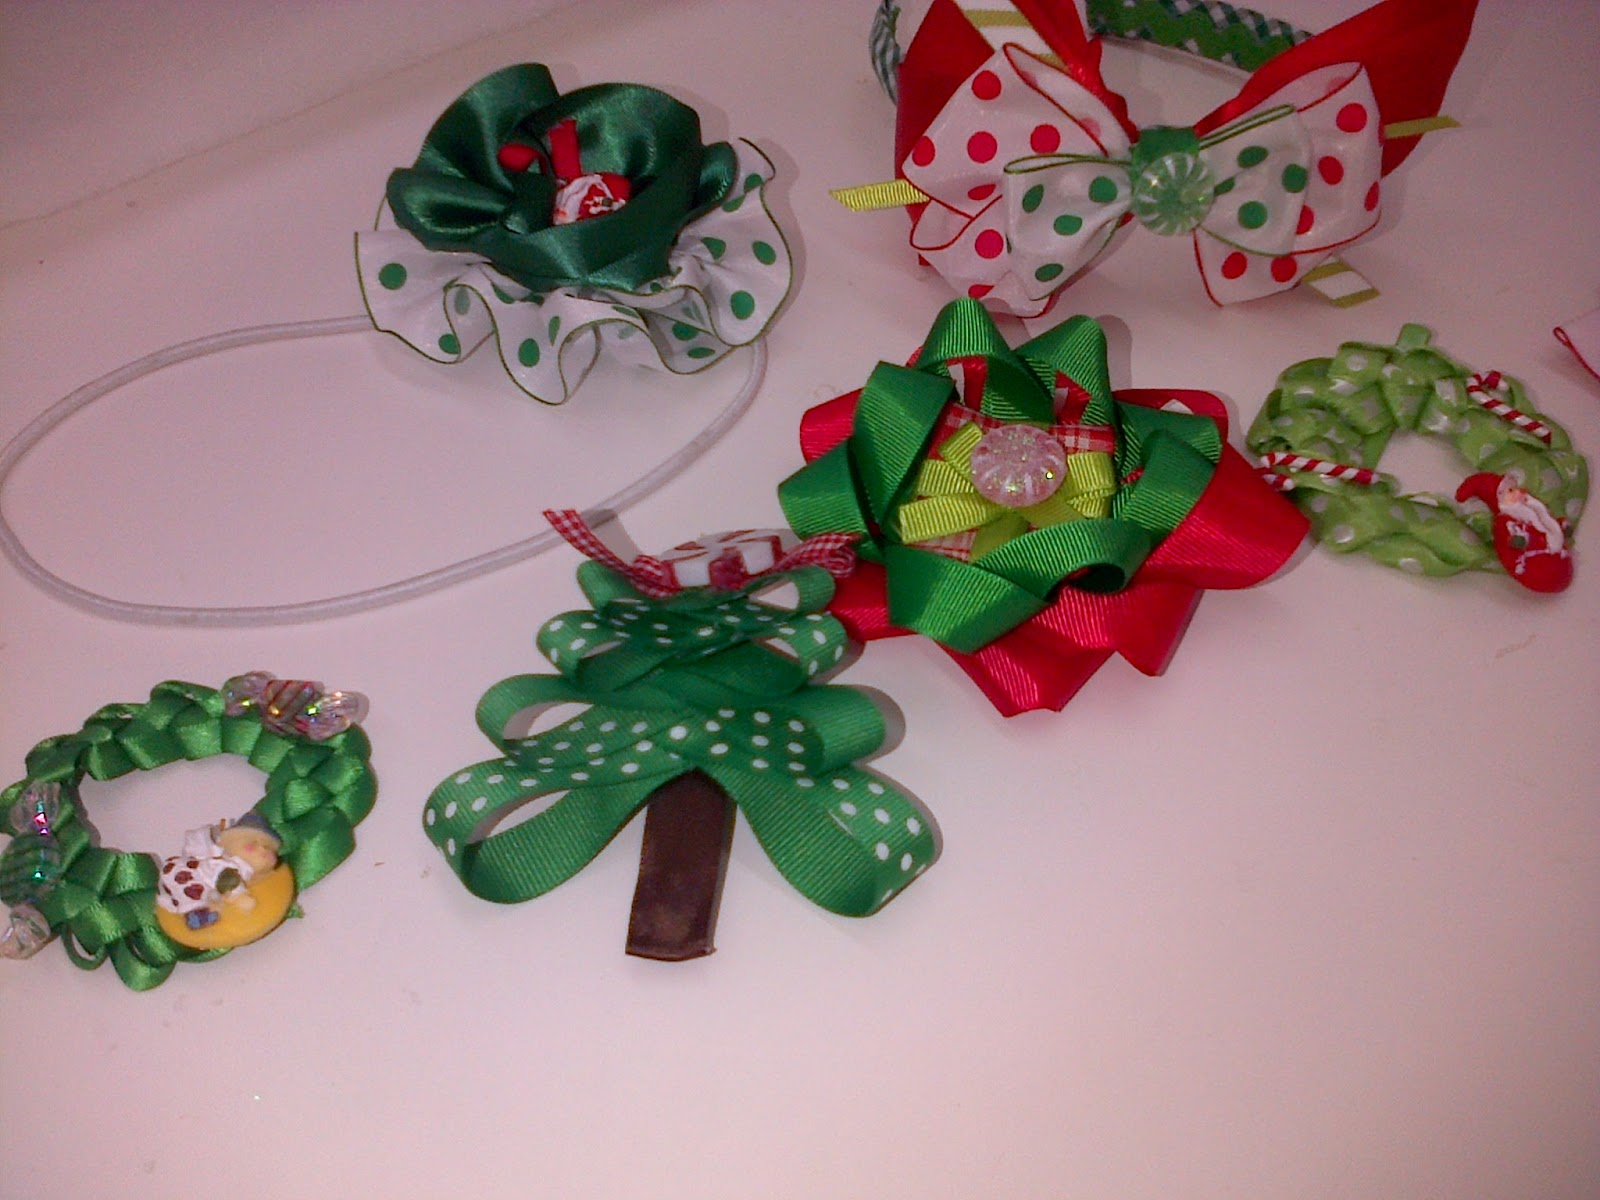 Dume papeleria stationery accesorios navide os para el - Accesorios navidenos para decorar ...